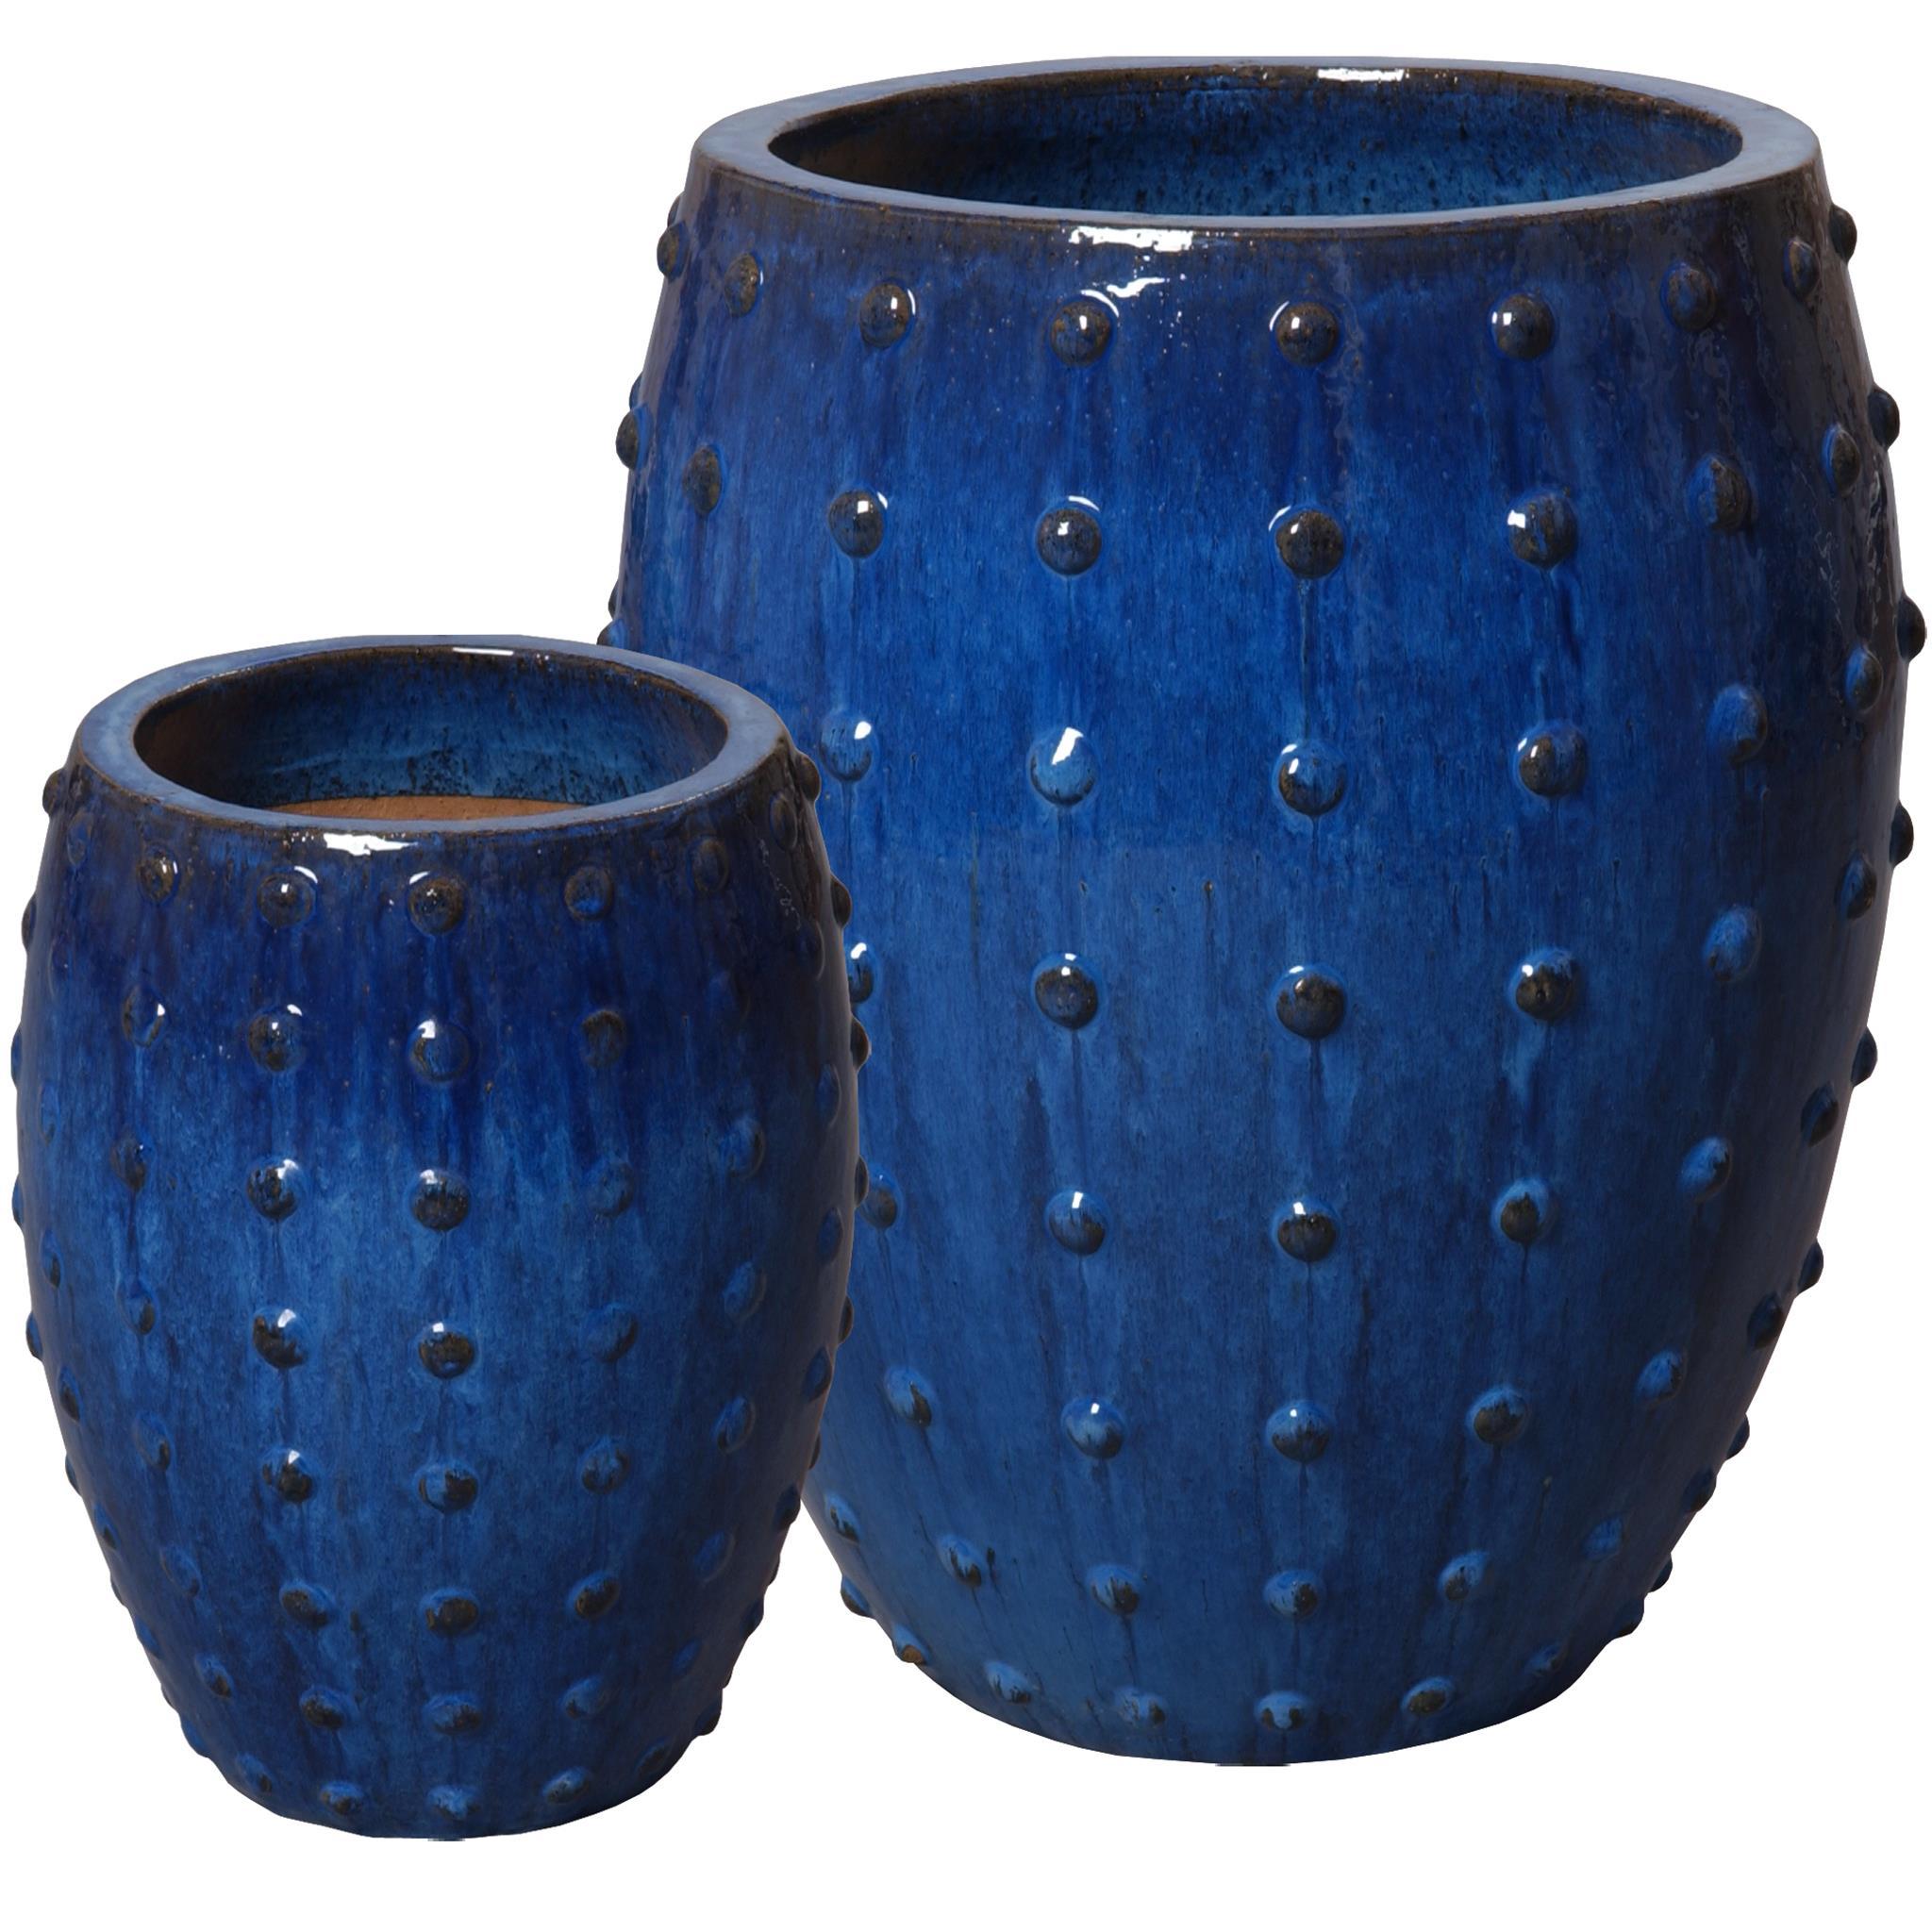 Charmant Studded Blue Planters